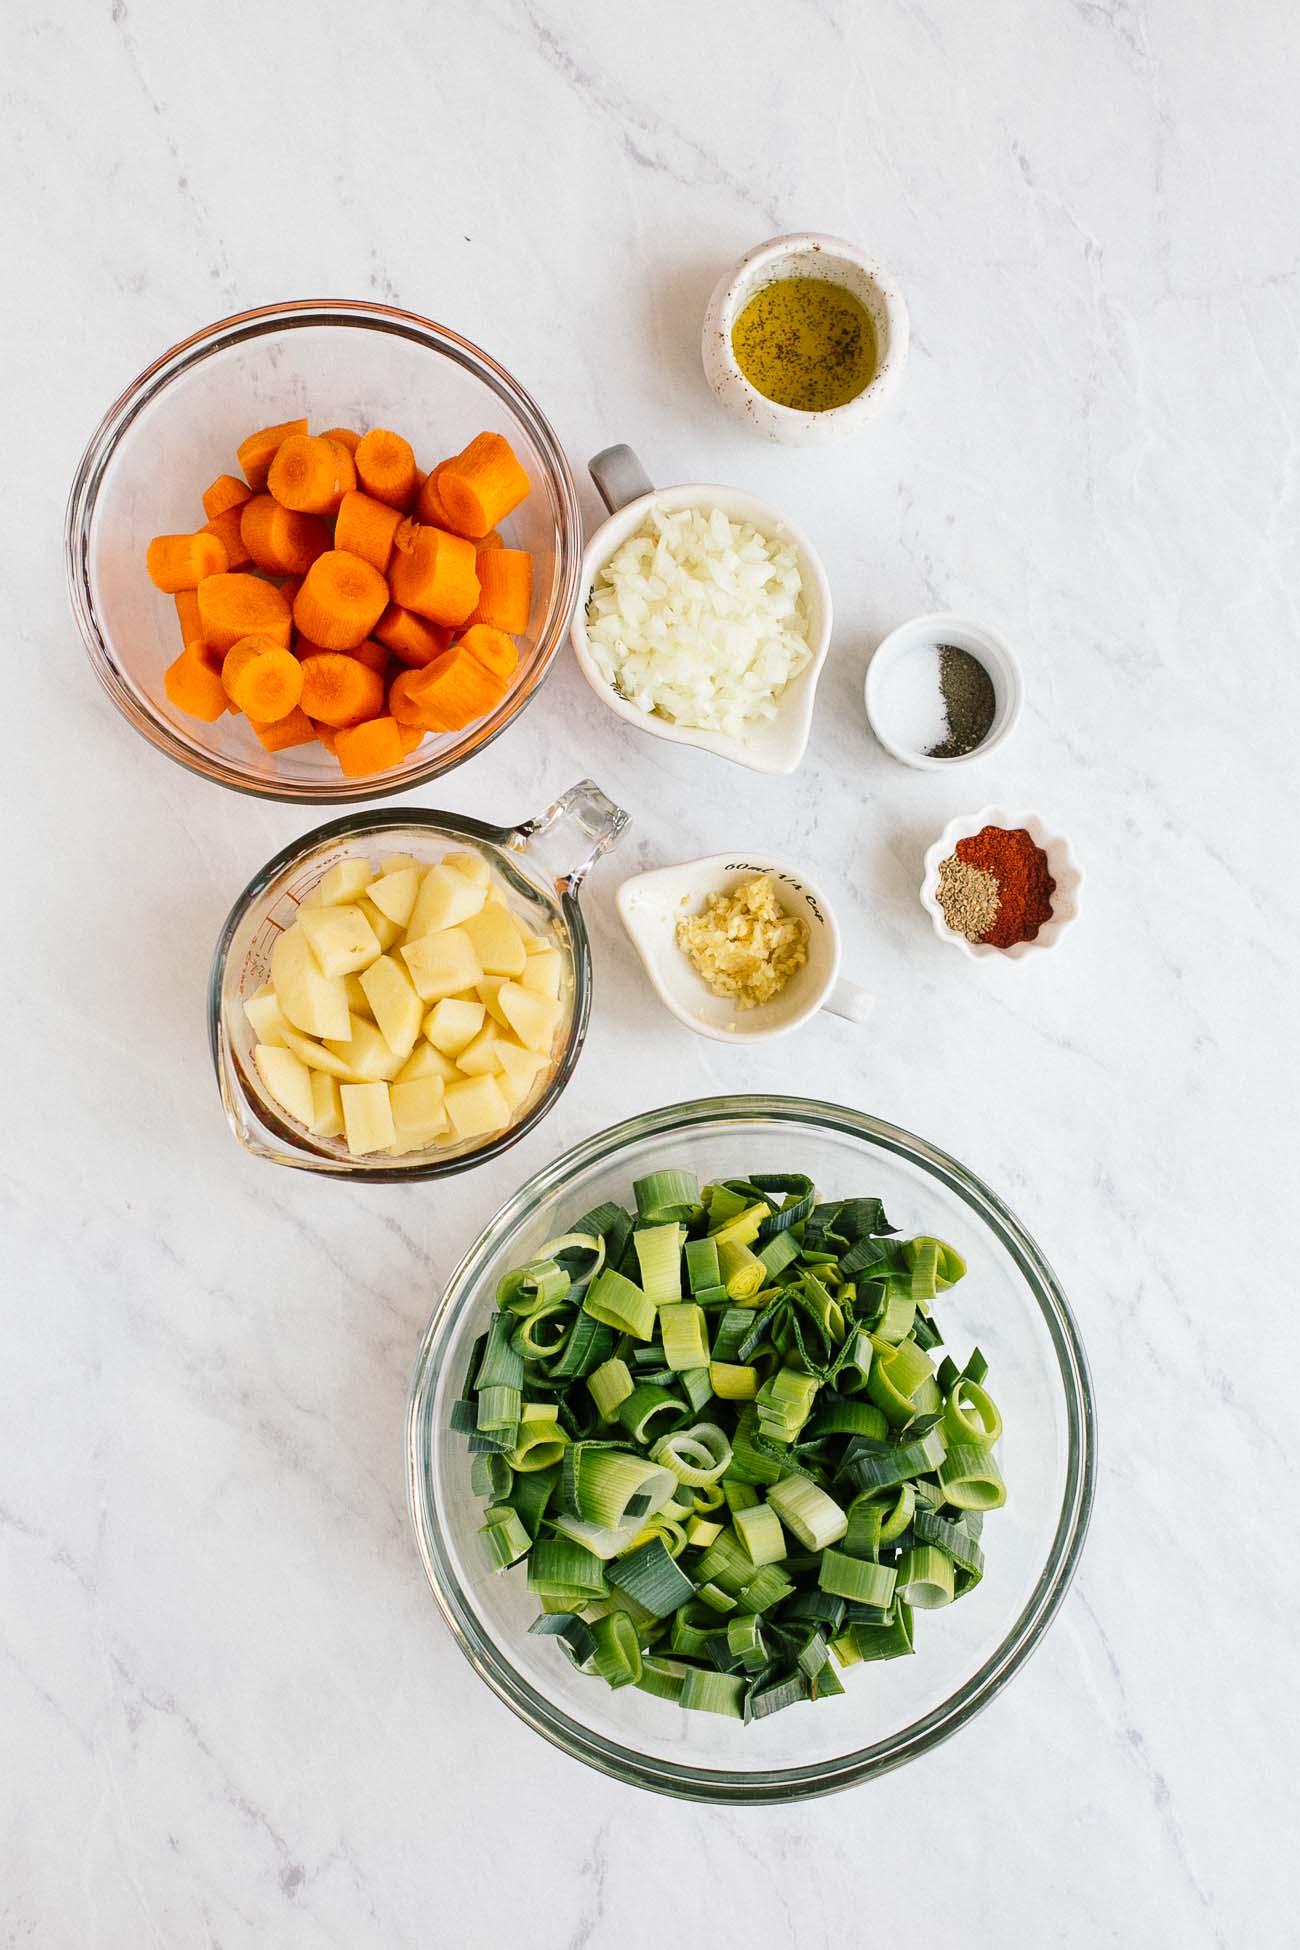 Overhead image of ingredients needed to make carrot leek soup.